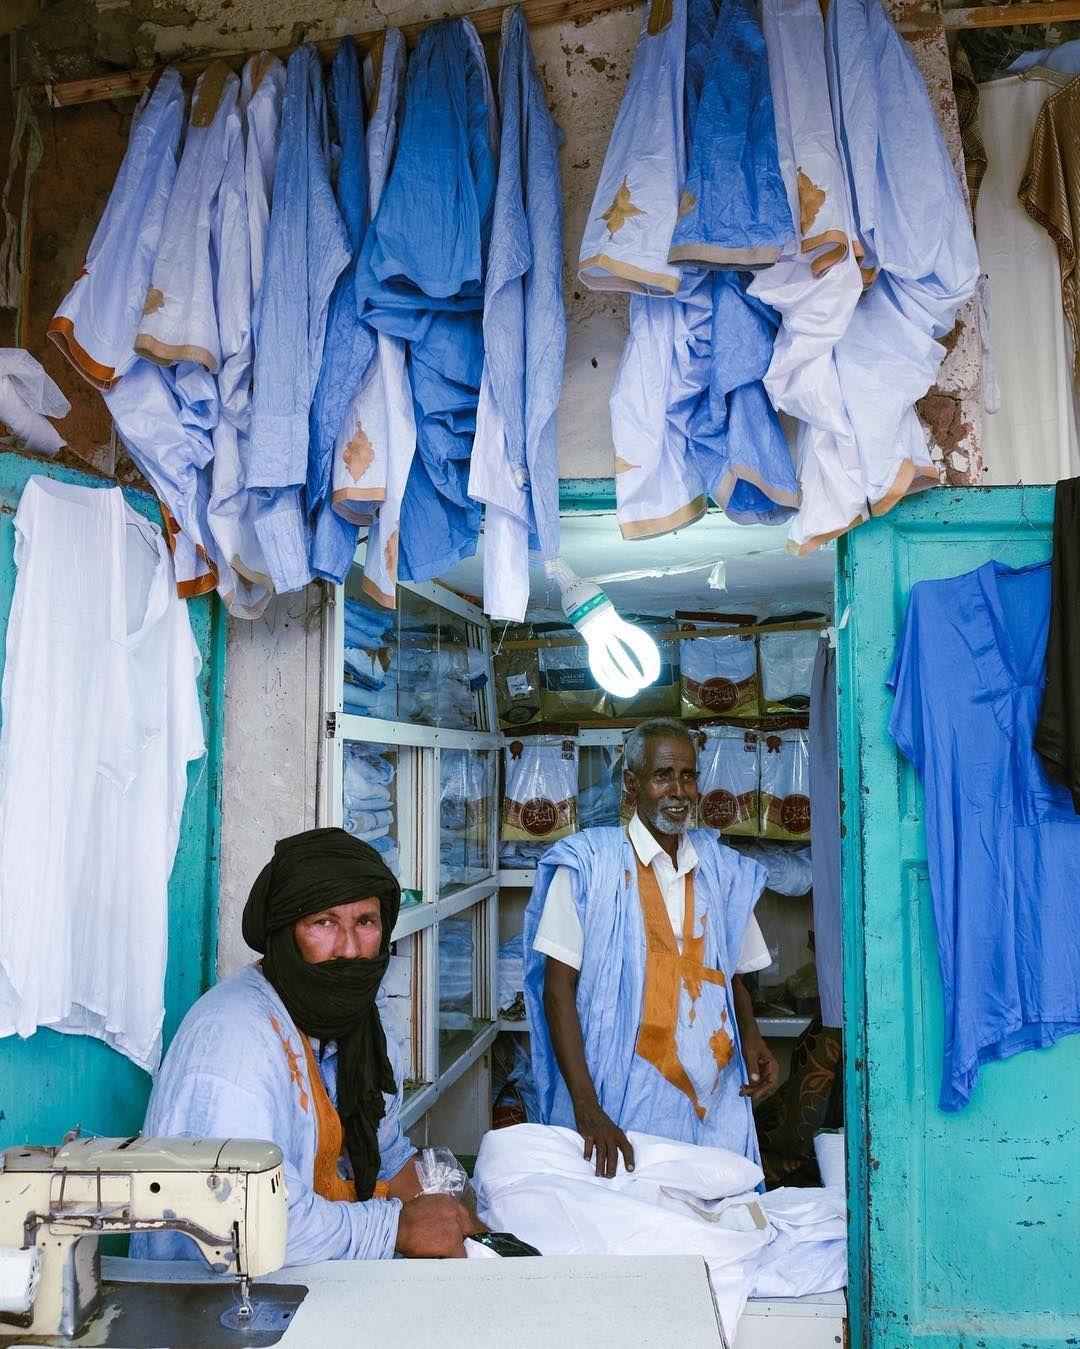 Ricci Shryock On Instagram Boubou Tailors In Nouakchott Mauritania The U S Government Announced This Month That It Will Ev Nouakchott Mauritania Instagram